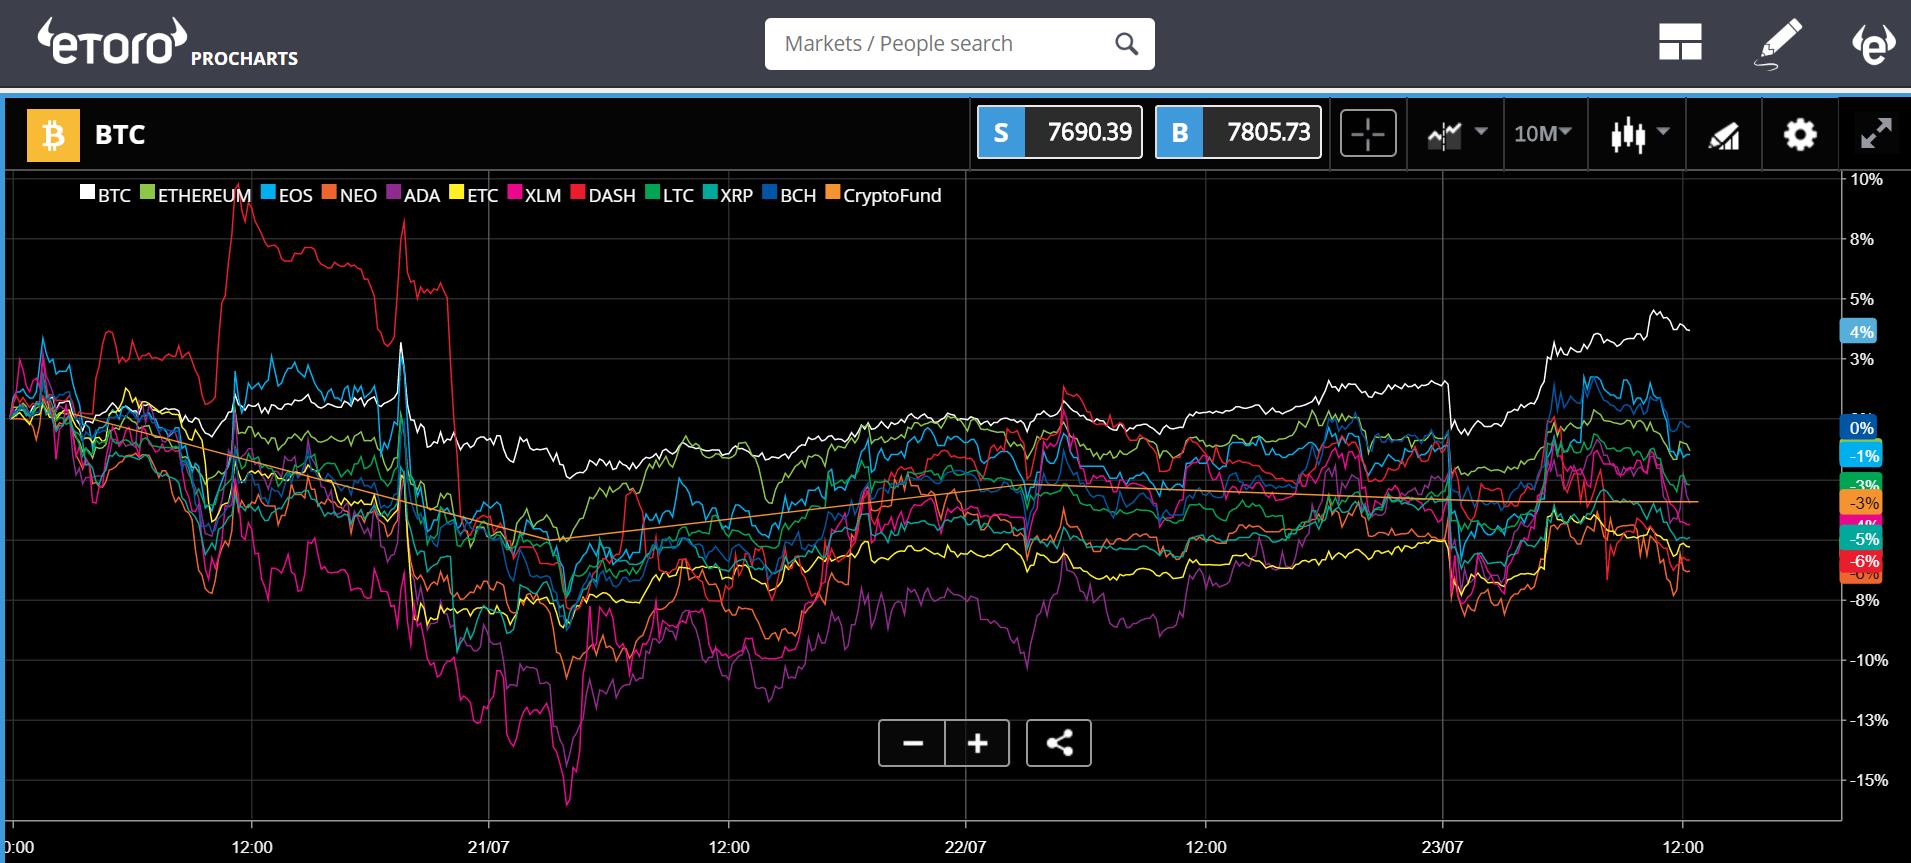 etoro, trading, markets, bonds, japan, china